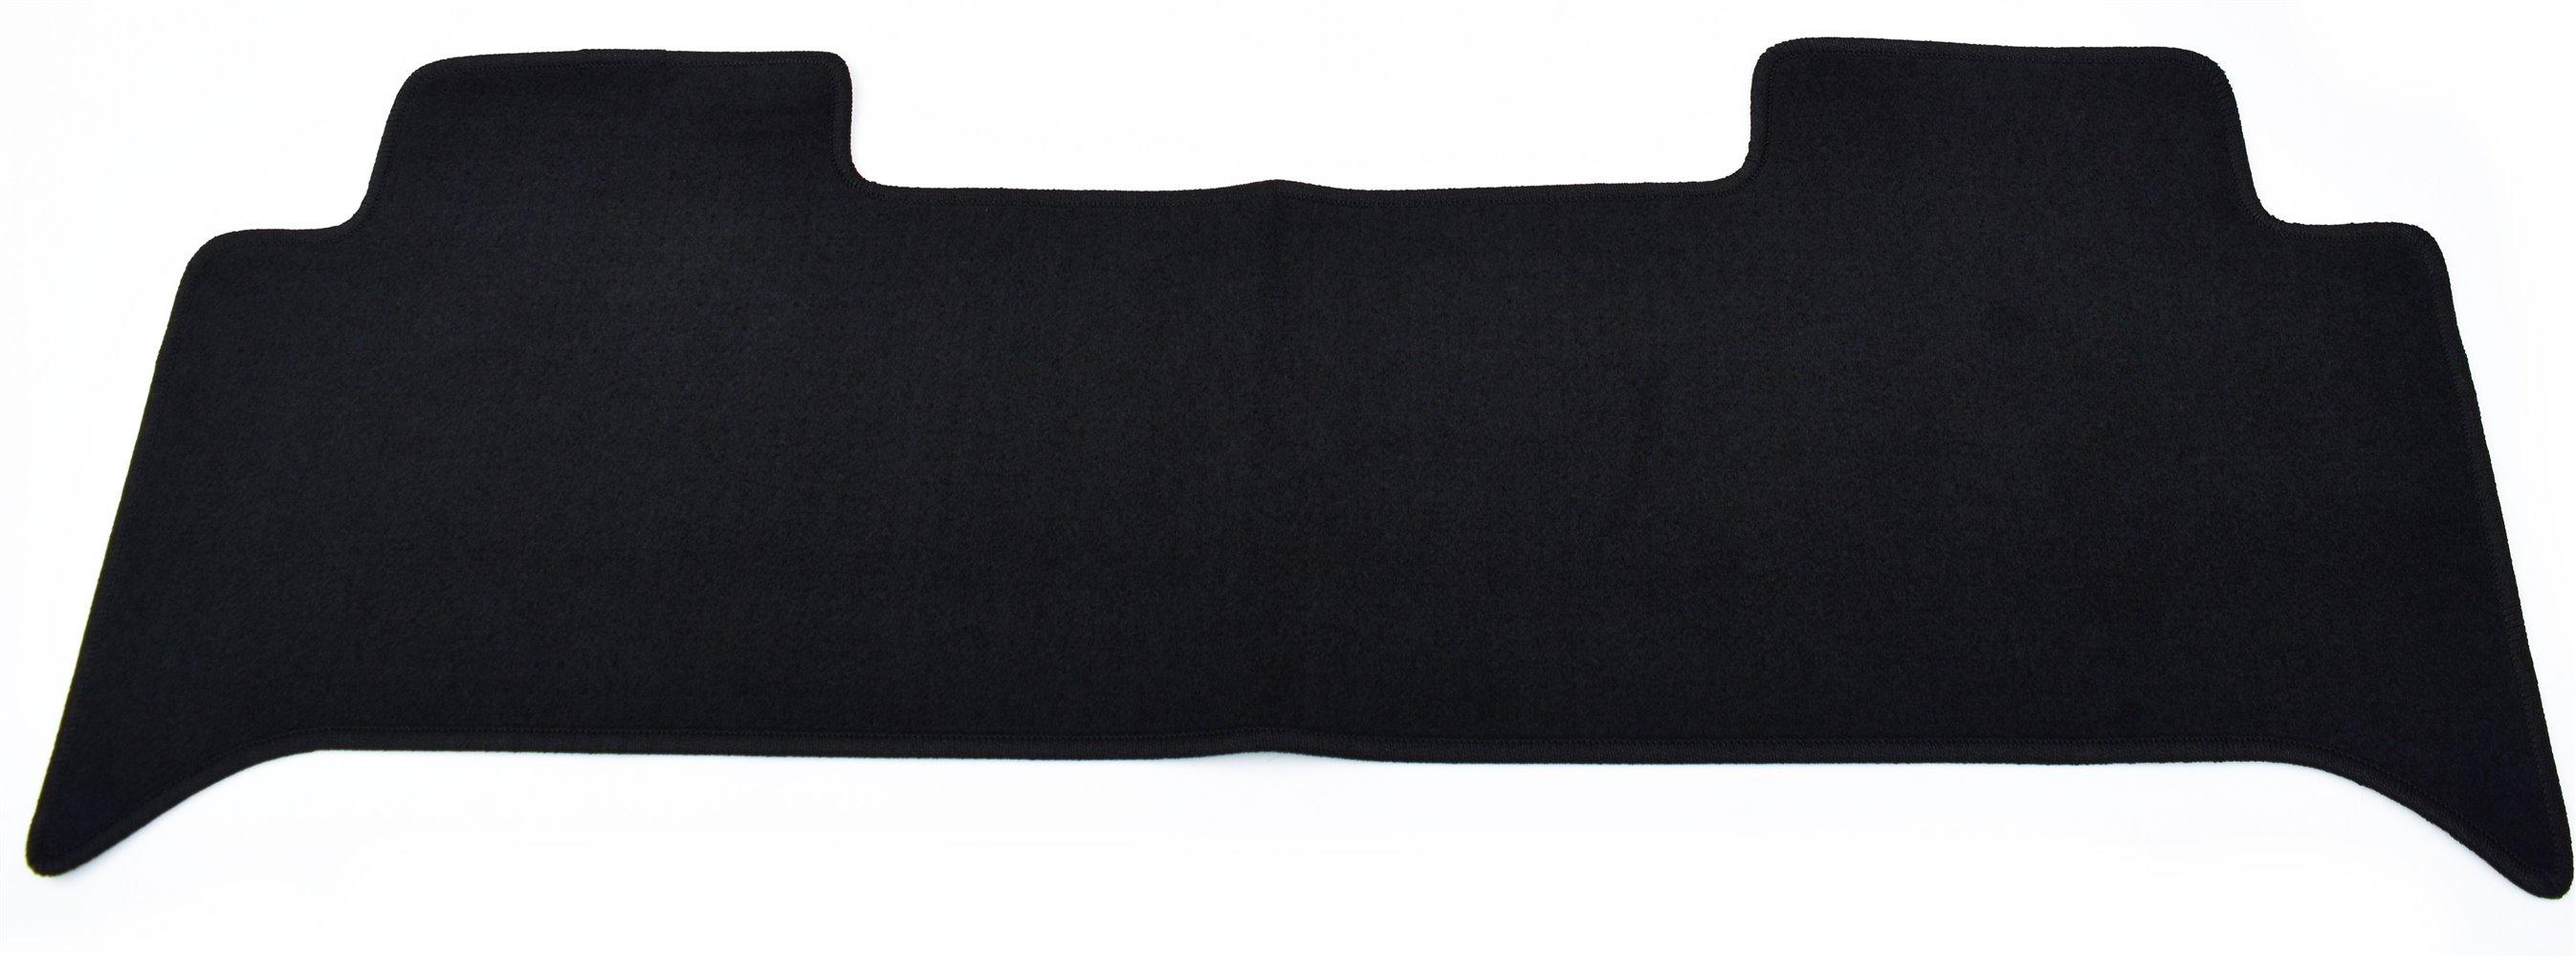 Коврики салона ворс чёрные Range Rover Vogue 2002-2012